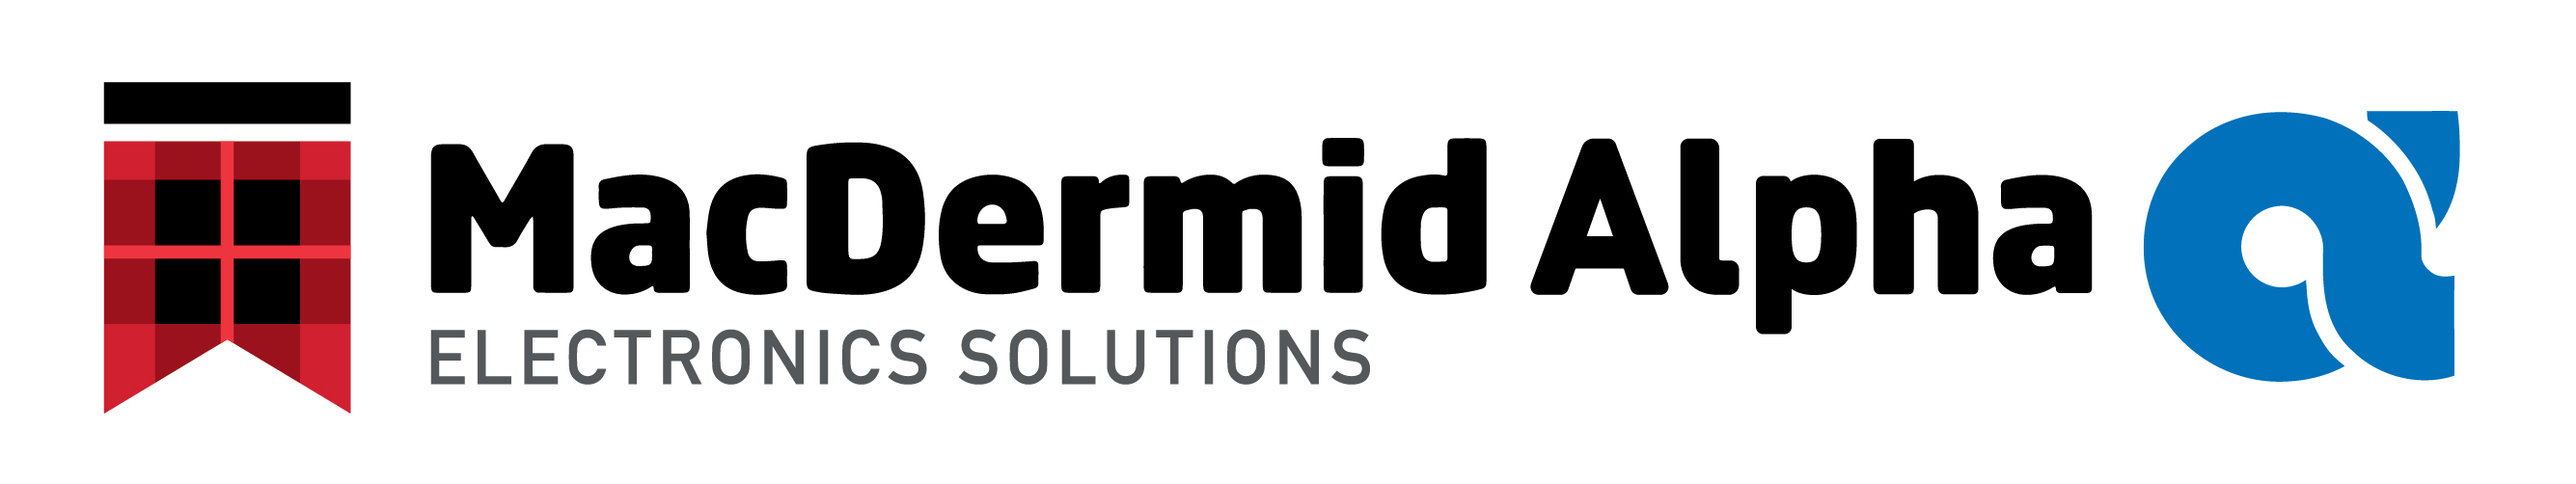 MacDermid Alpha将在国际电子电路(上海)展览会上推广最新技术与产品